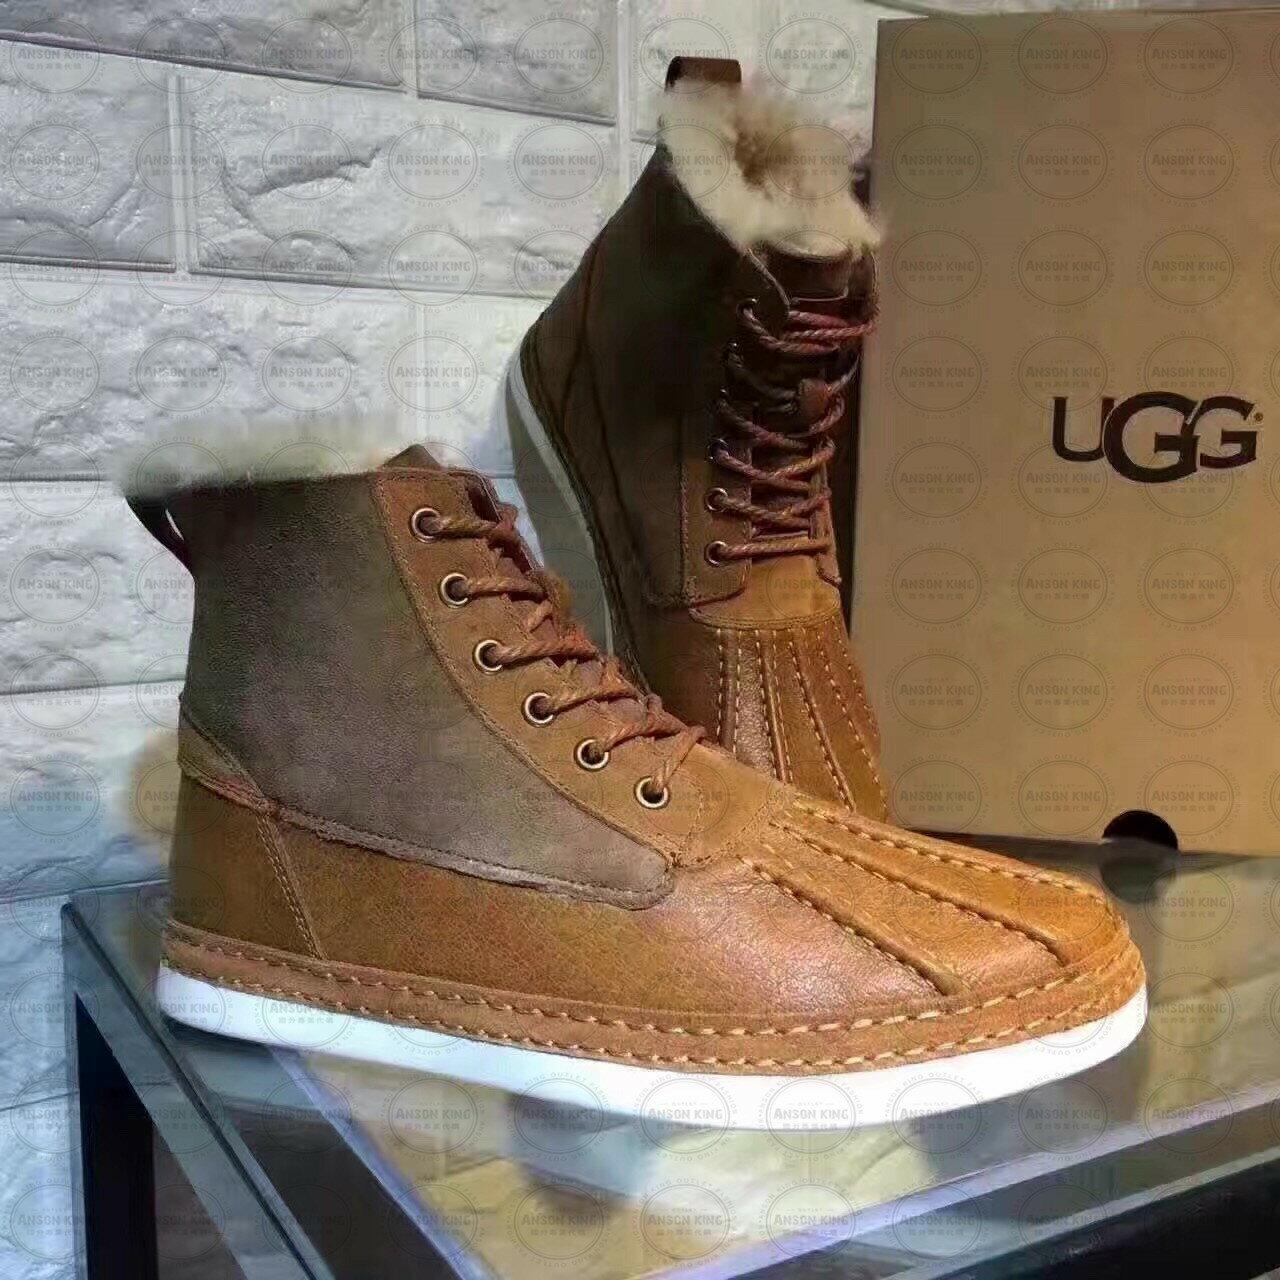 OUTLET正品代購 澳洲 UGG 冬季男款貝殼頭馬丁靴 短靴 保暖 真皮羊皮毛 雪靴 短靴 栗色 3